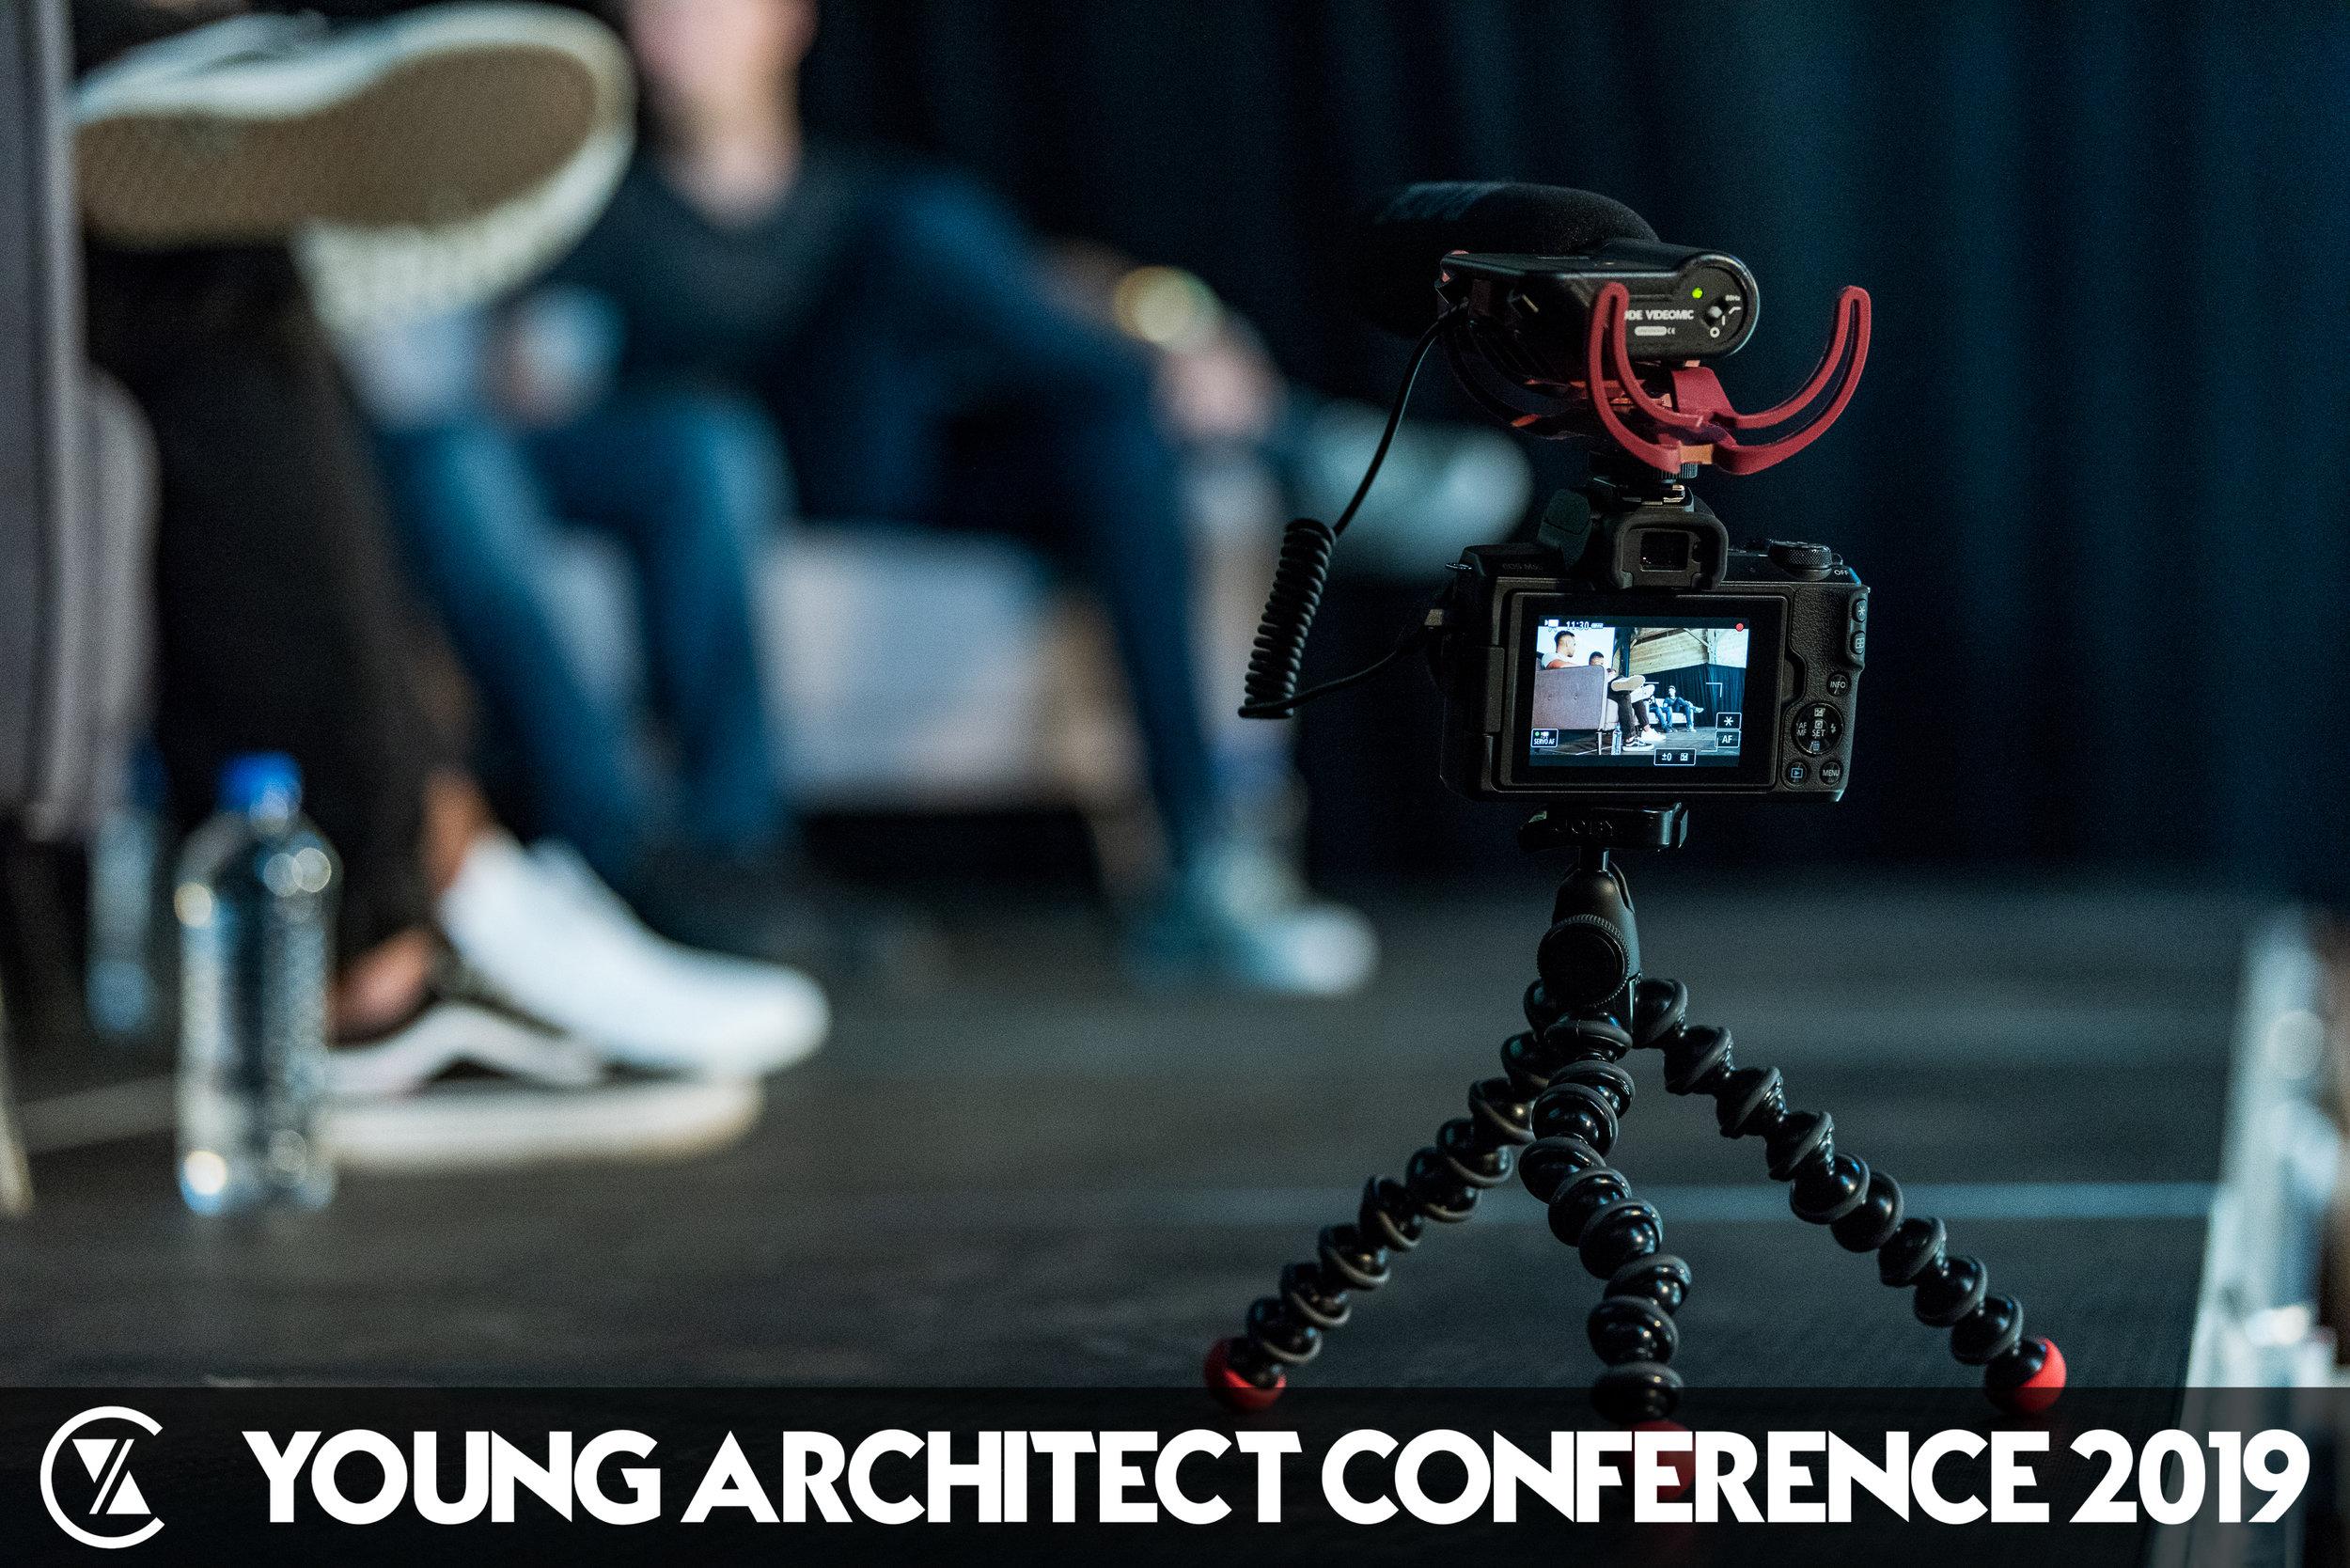 Joseph takes film during the Content Creators workshop. Photo Credit:  @niou.photo